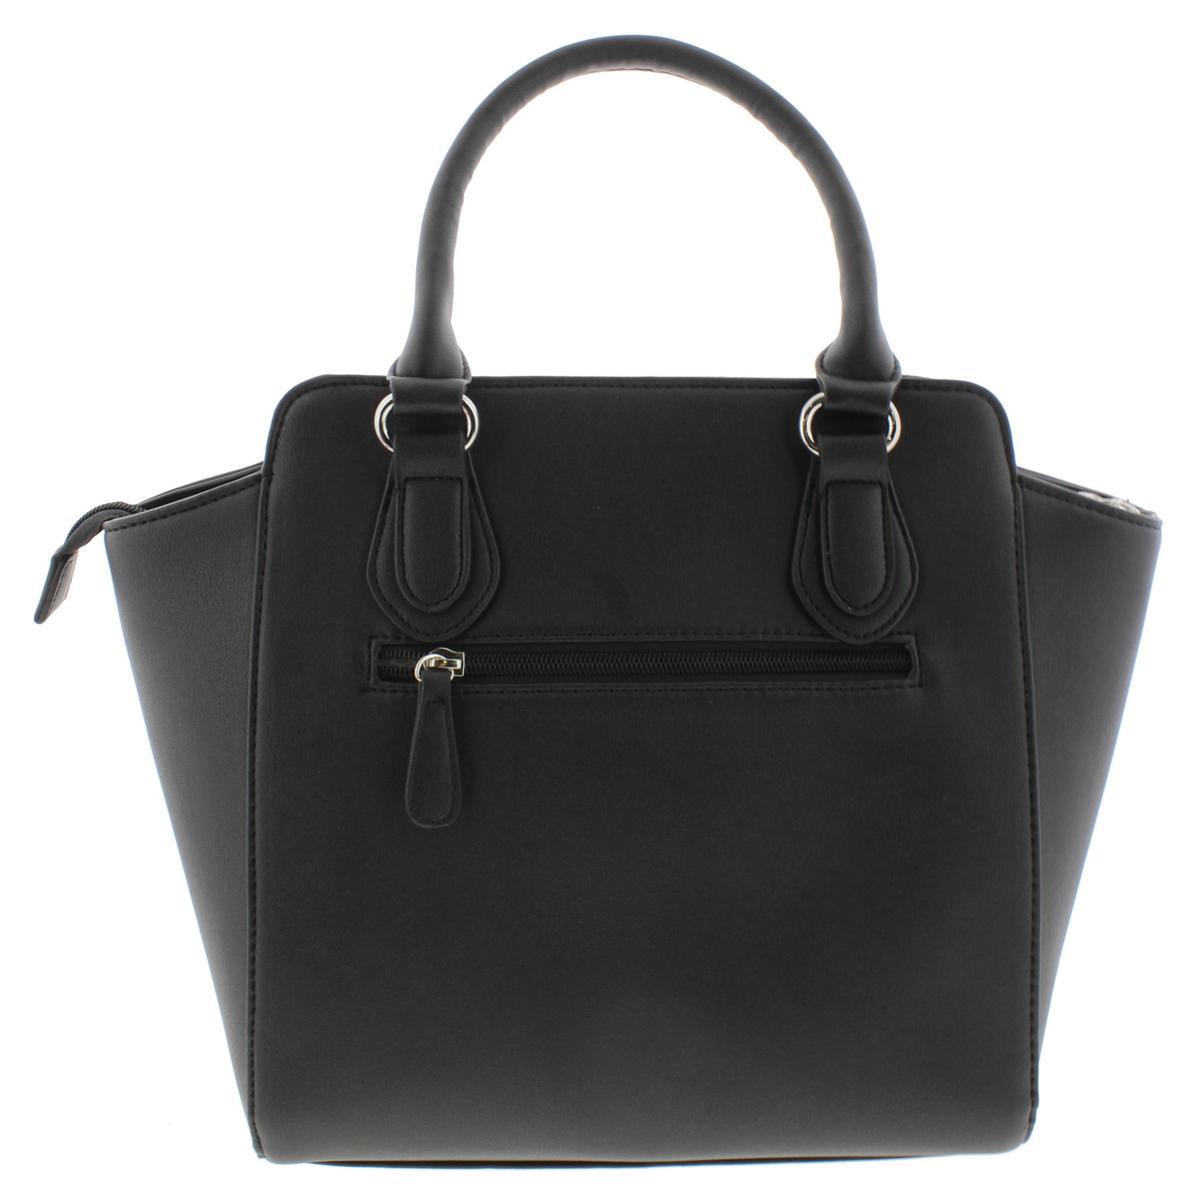 Catherine Malandrino 7090 Womens Collette Leather Tote Handbag Purse BHFO